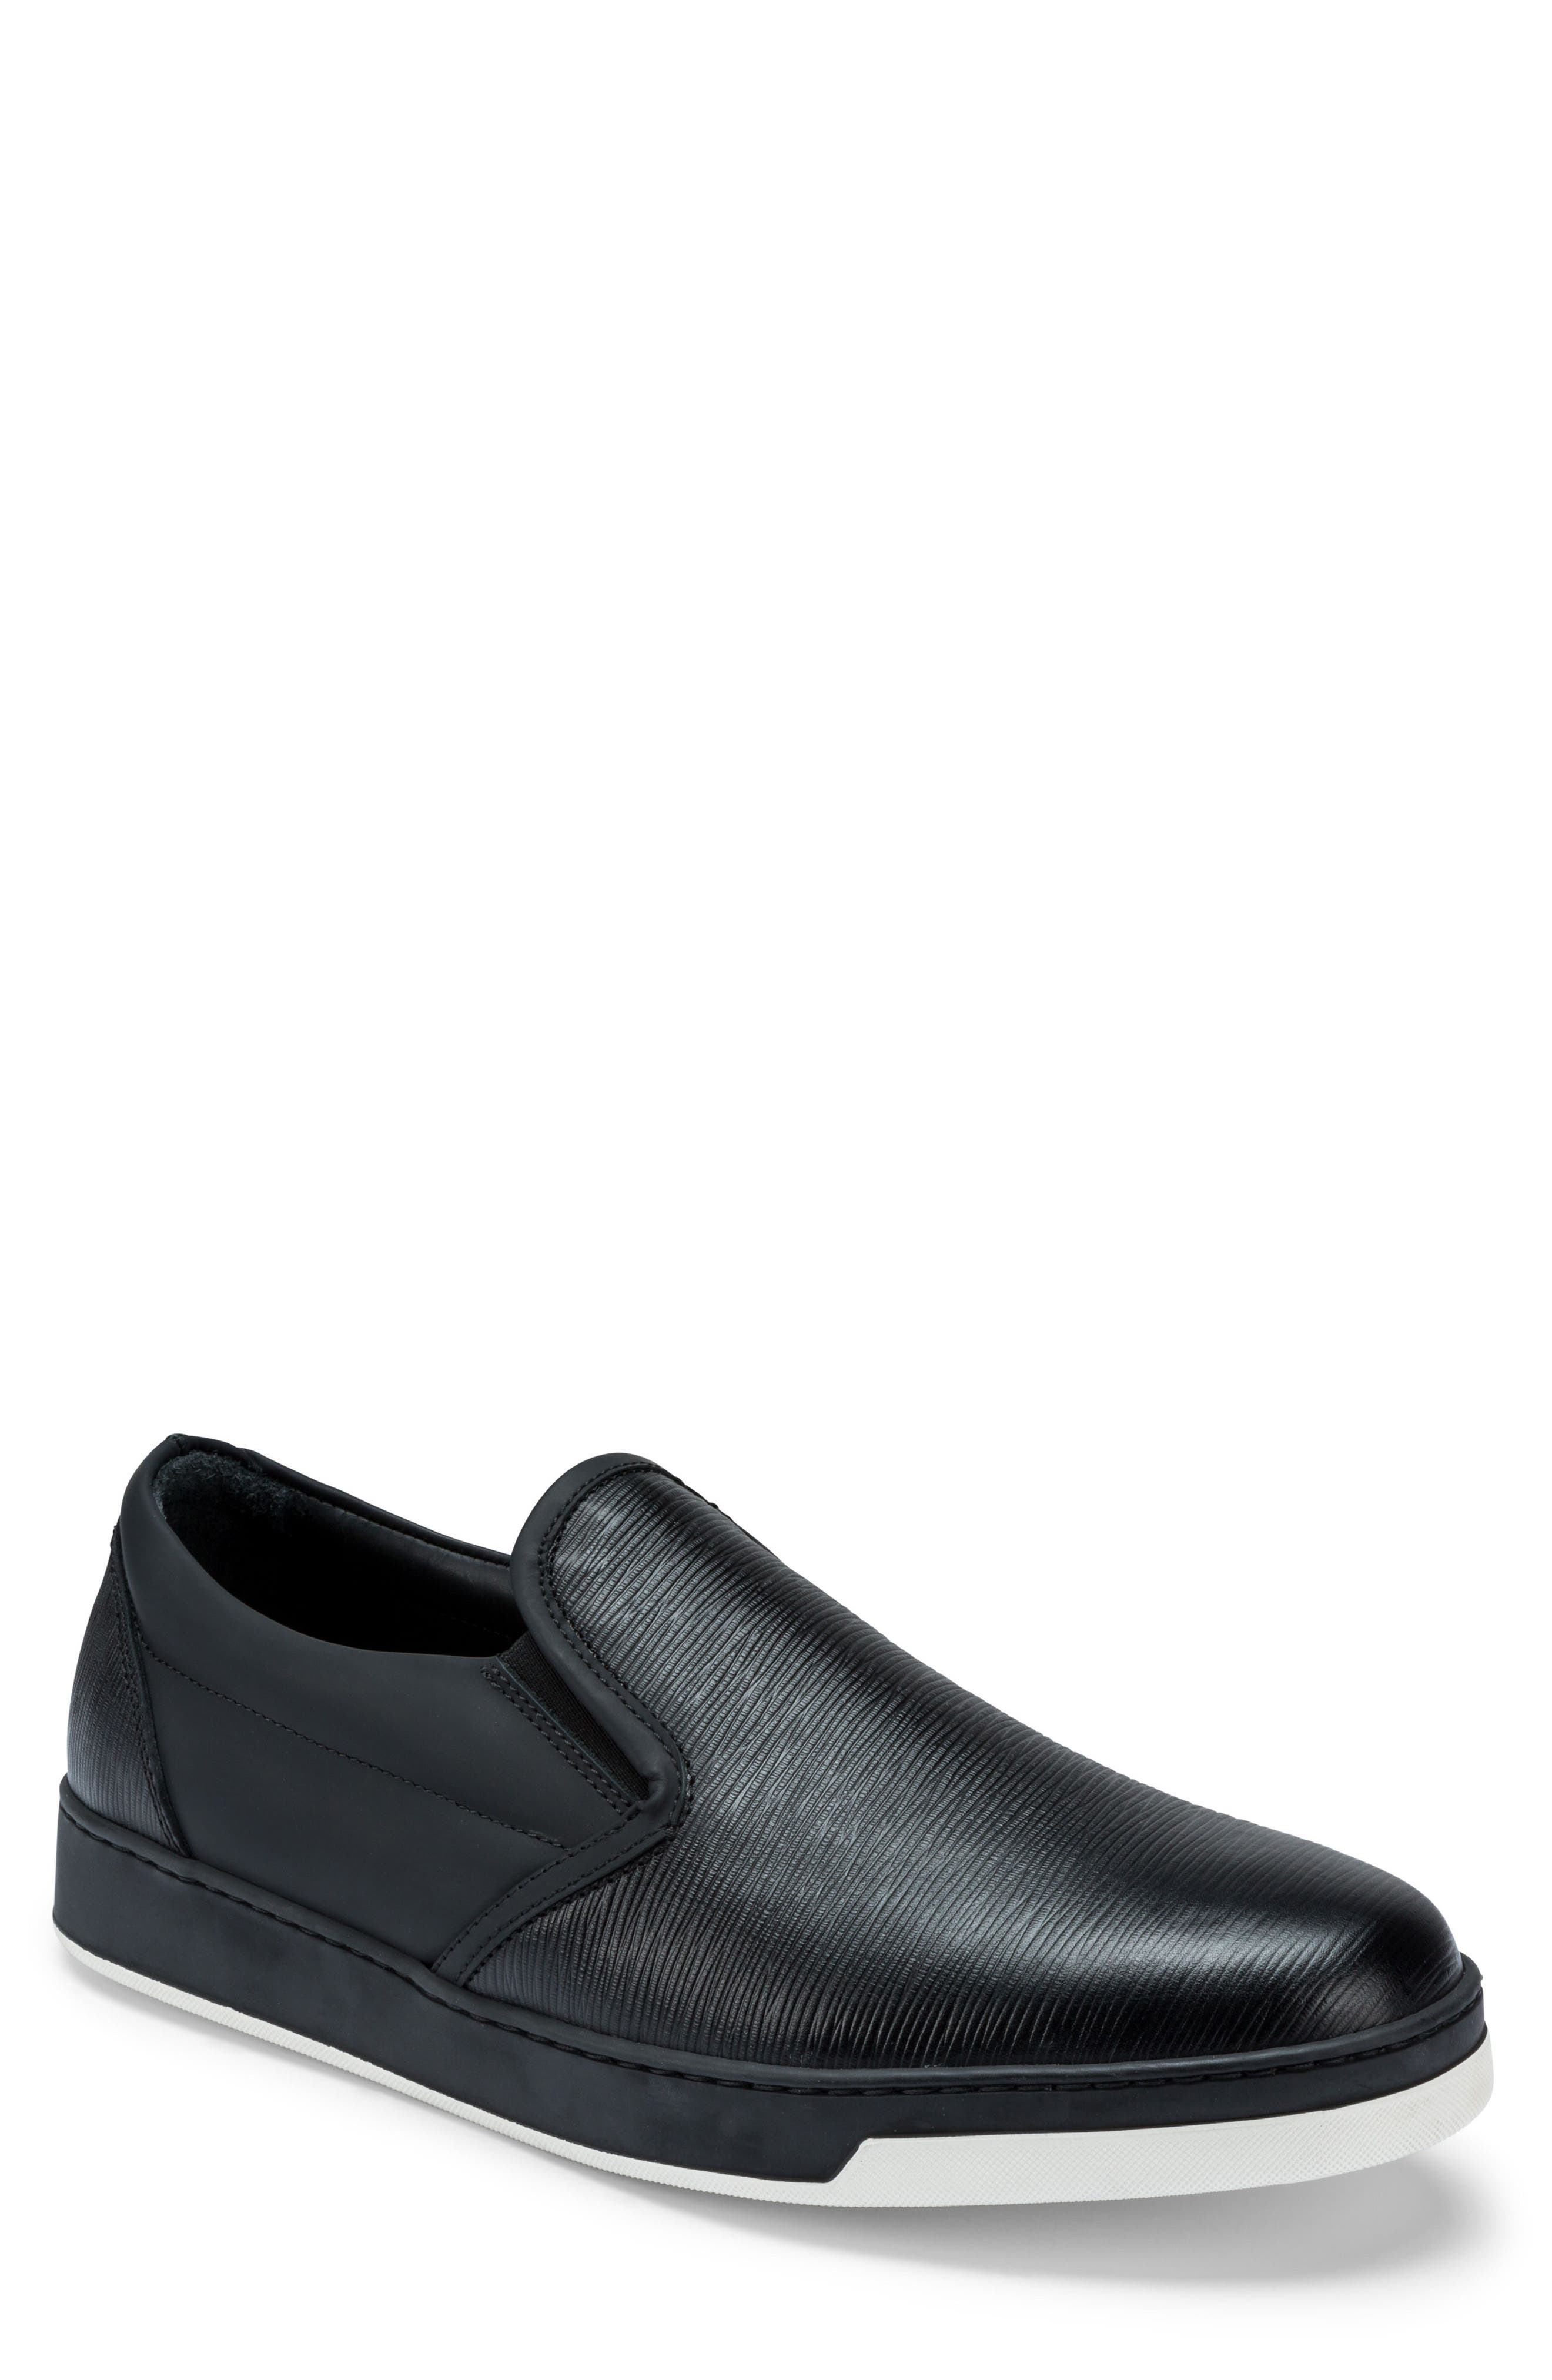 Main Image - Bugatchi Santorini Slip-On Sneaker (Men)